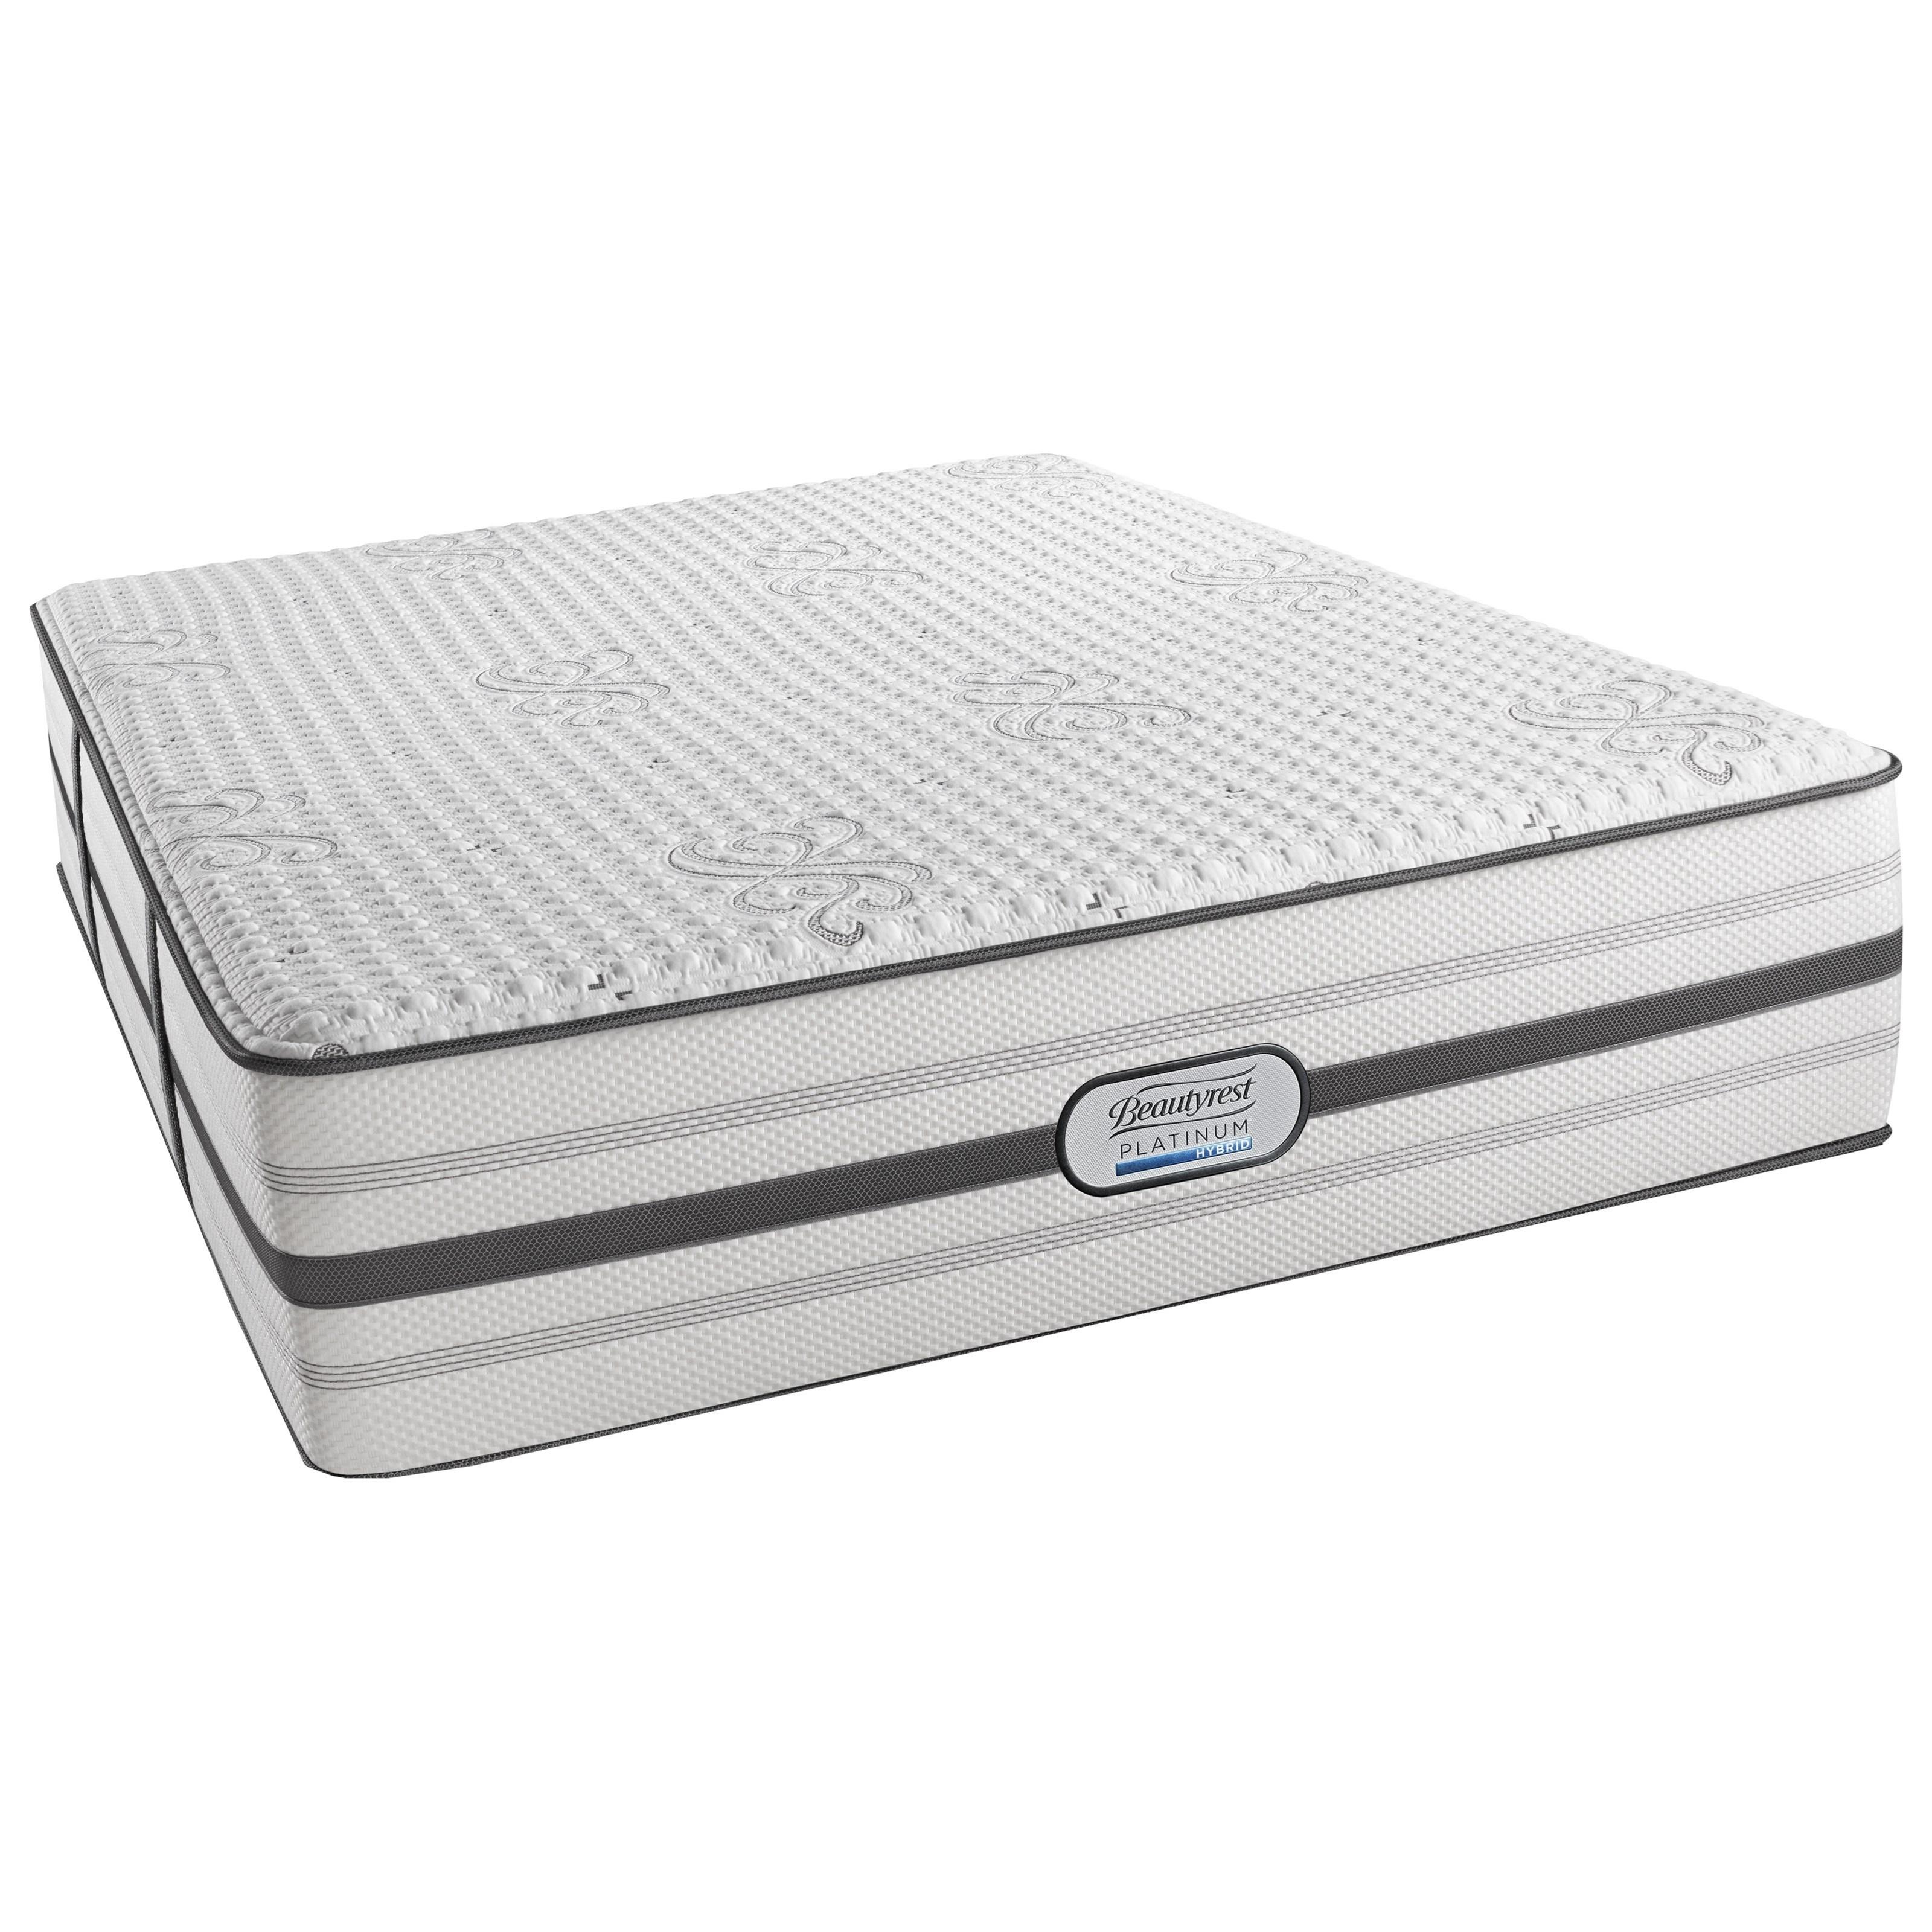 Beautyrest Platinum Hybrid Maddie Queen Luxury Firm Adjustable Set - Item Number: BRHLV3LF-Q+SM3-Q